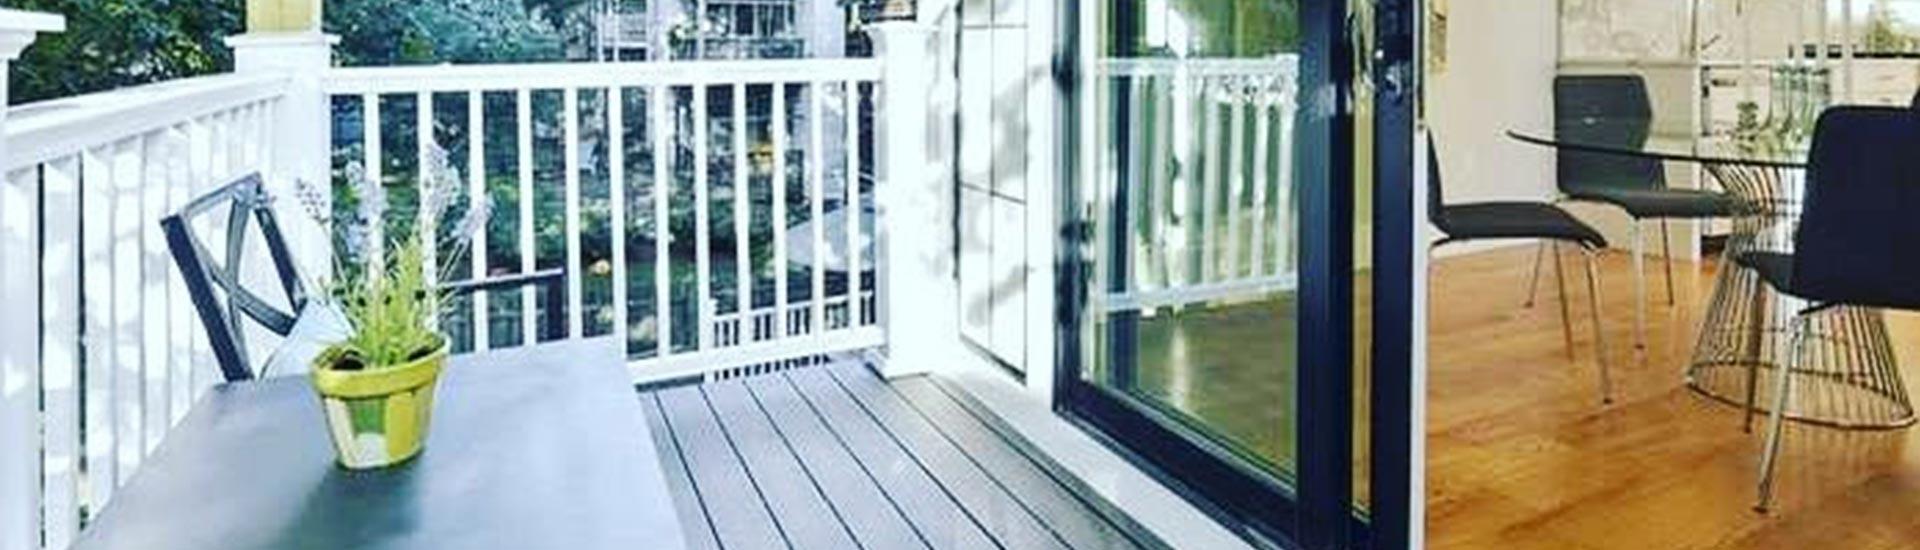 roof-deck-14